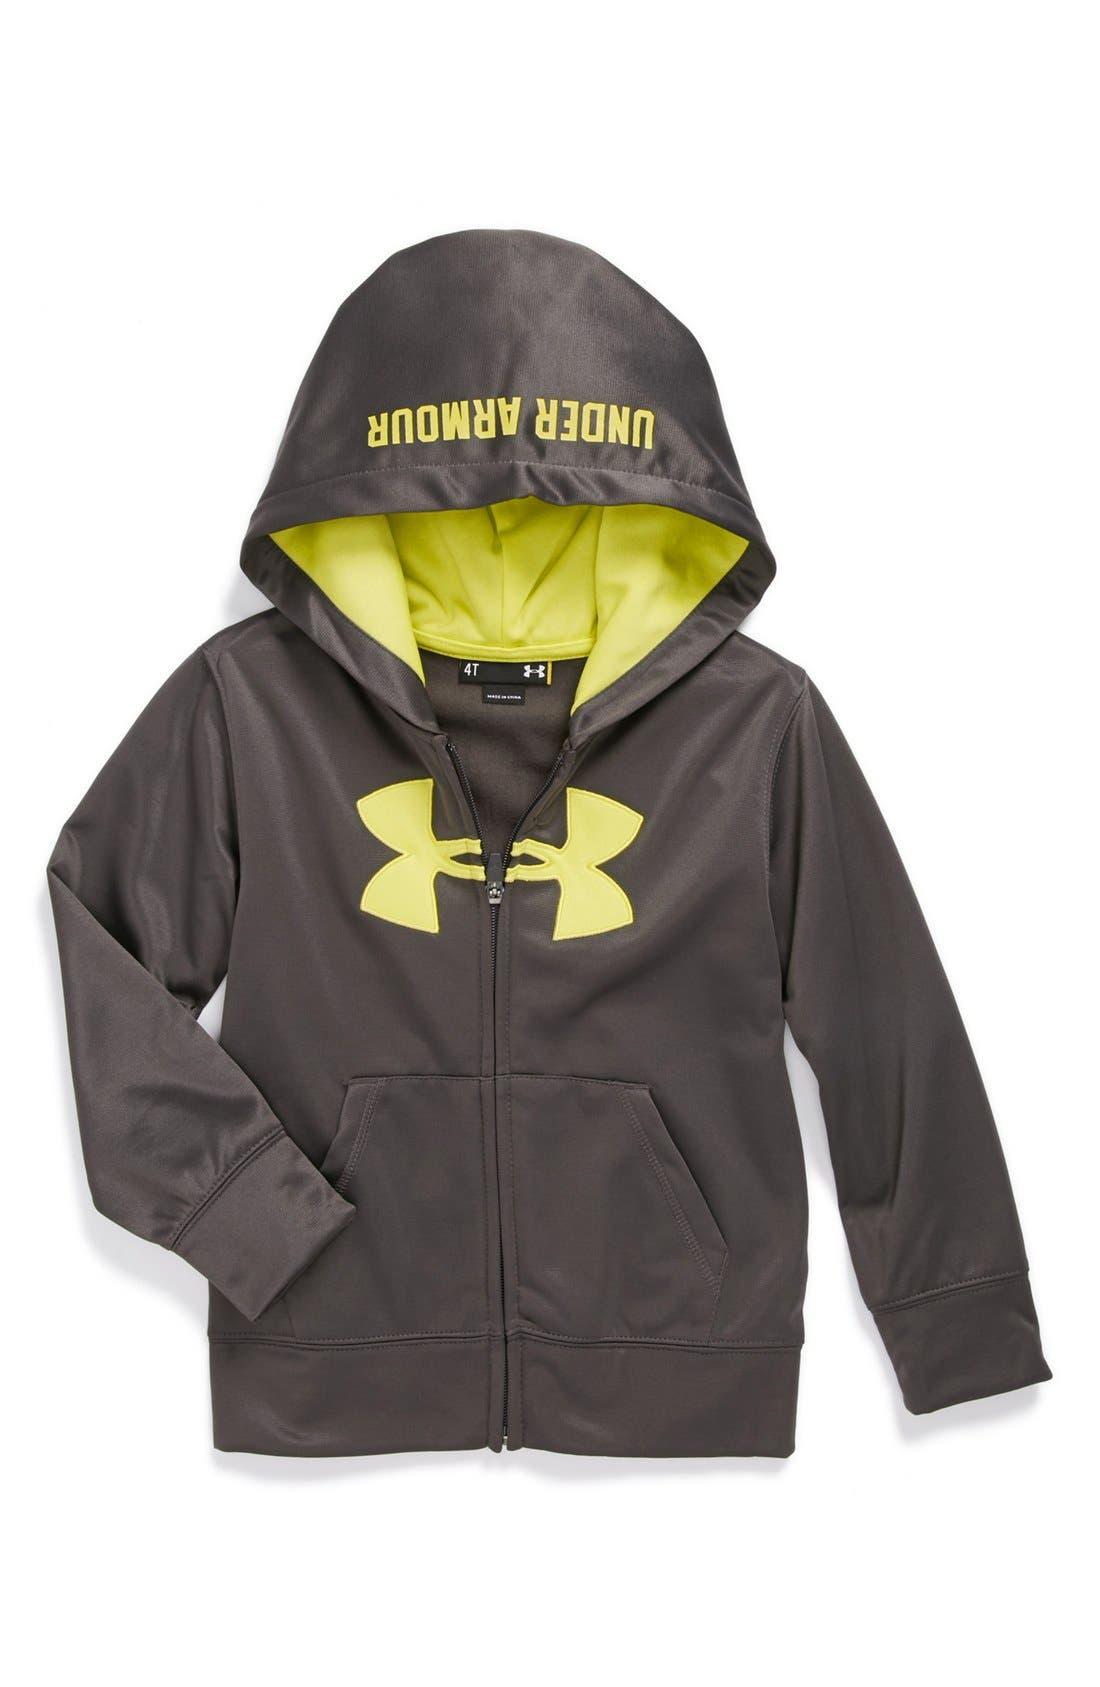 Main Image - Under Armour 'Big Logo' Hoodie (Toddler Boys)